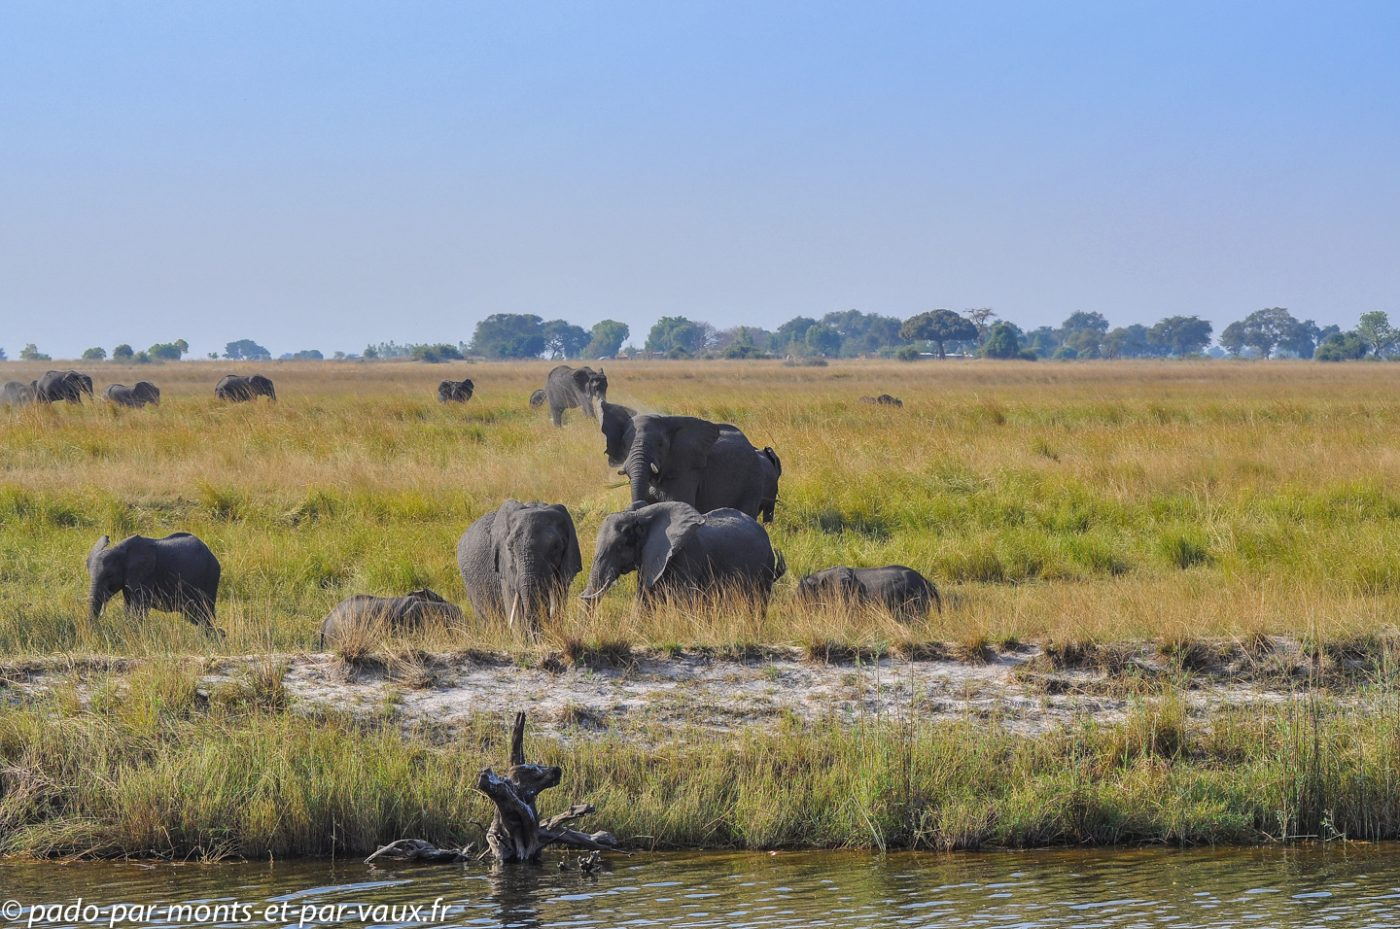 Rivière Chobe - Elephants